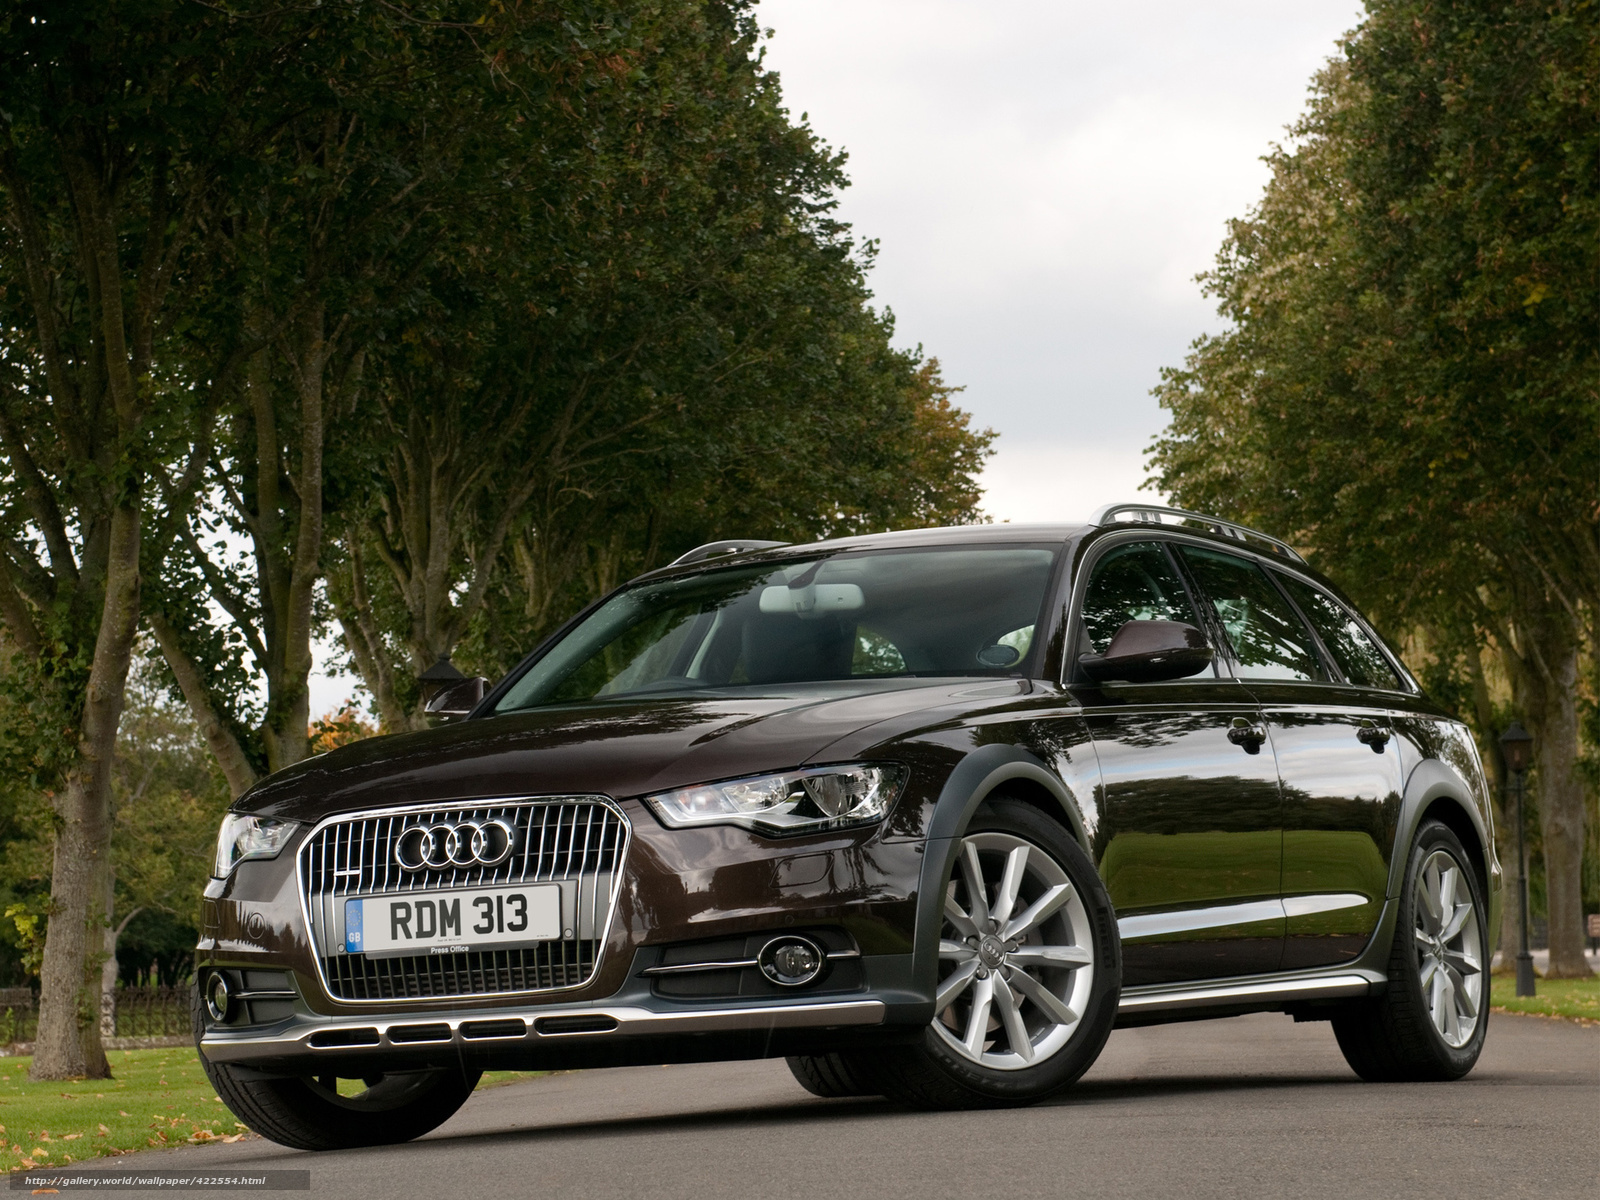 Download wallpaper Audi A6 allroad Touring free desktop